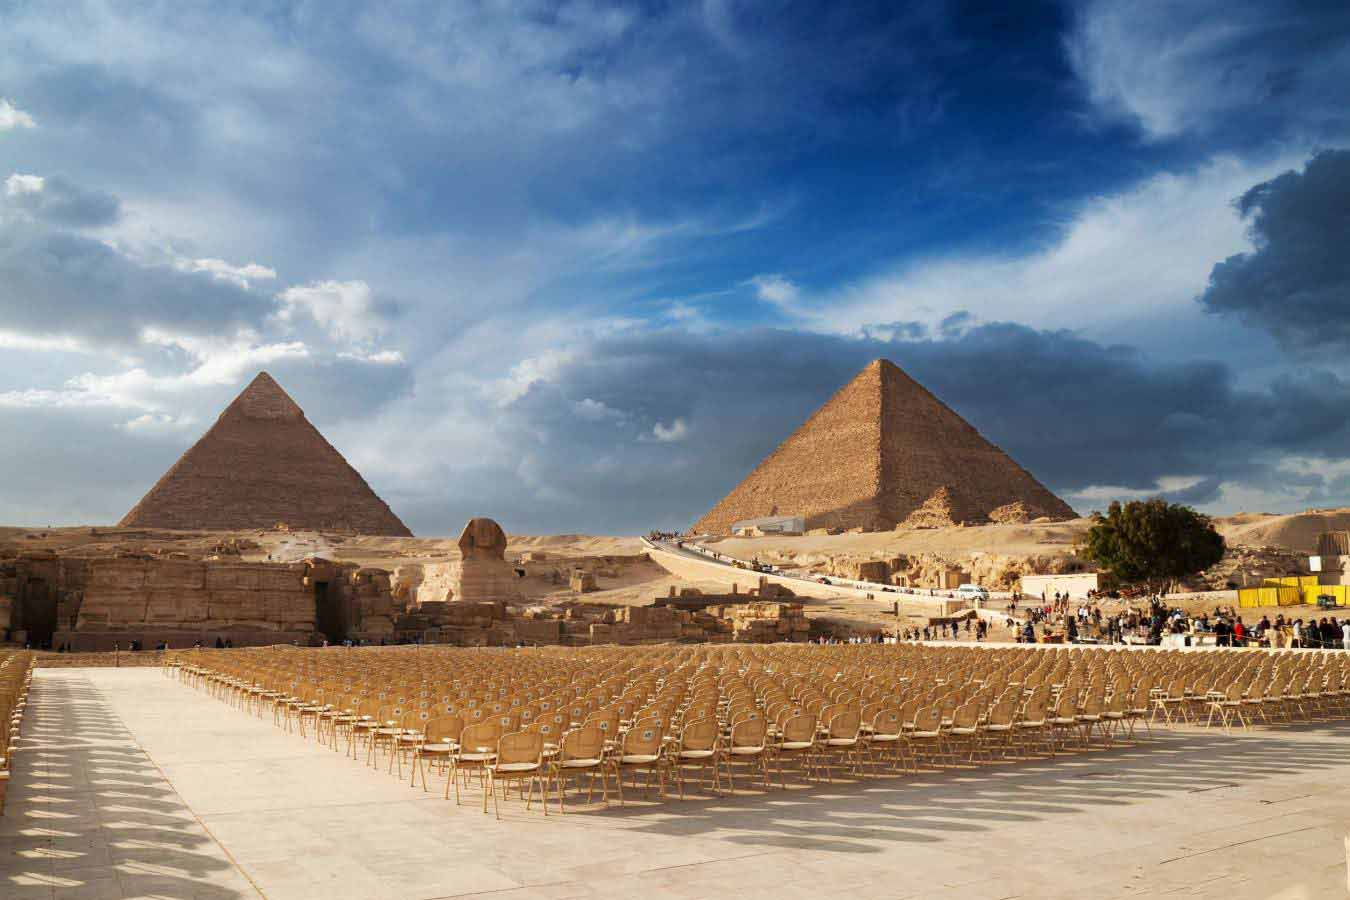 Trip Cairo and Giza pyramids from Hurghada | Cairo trips